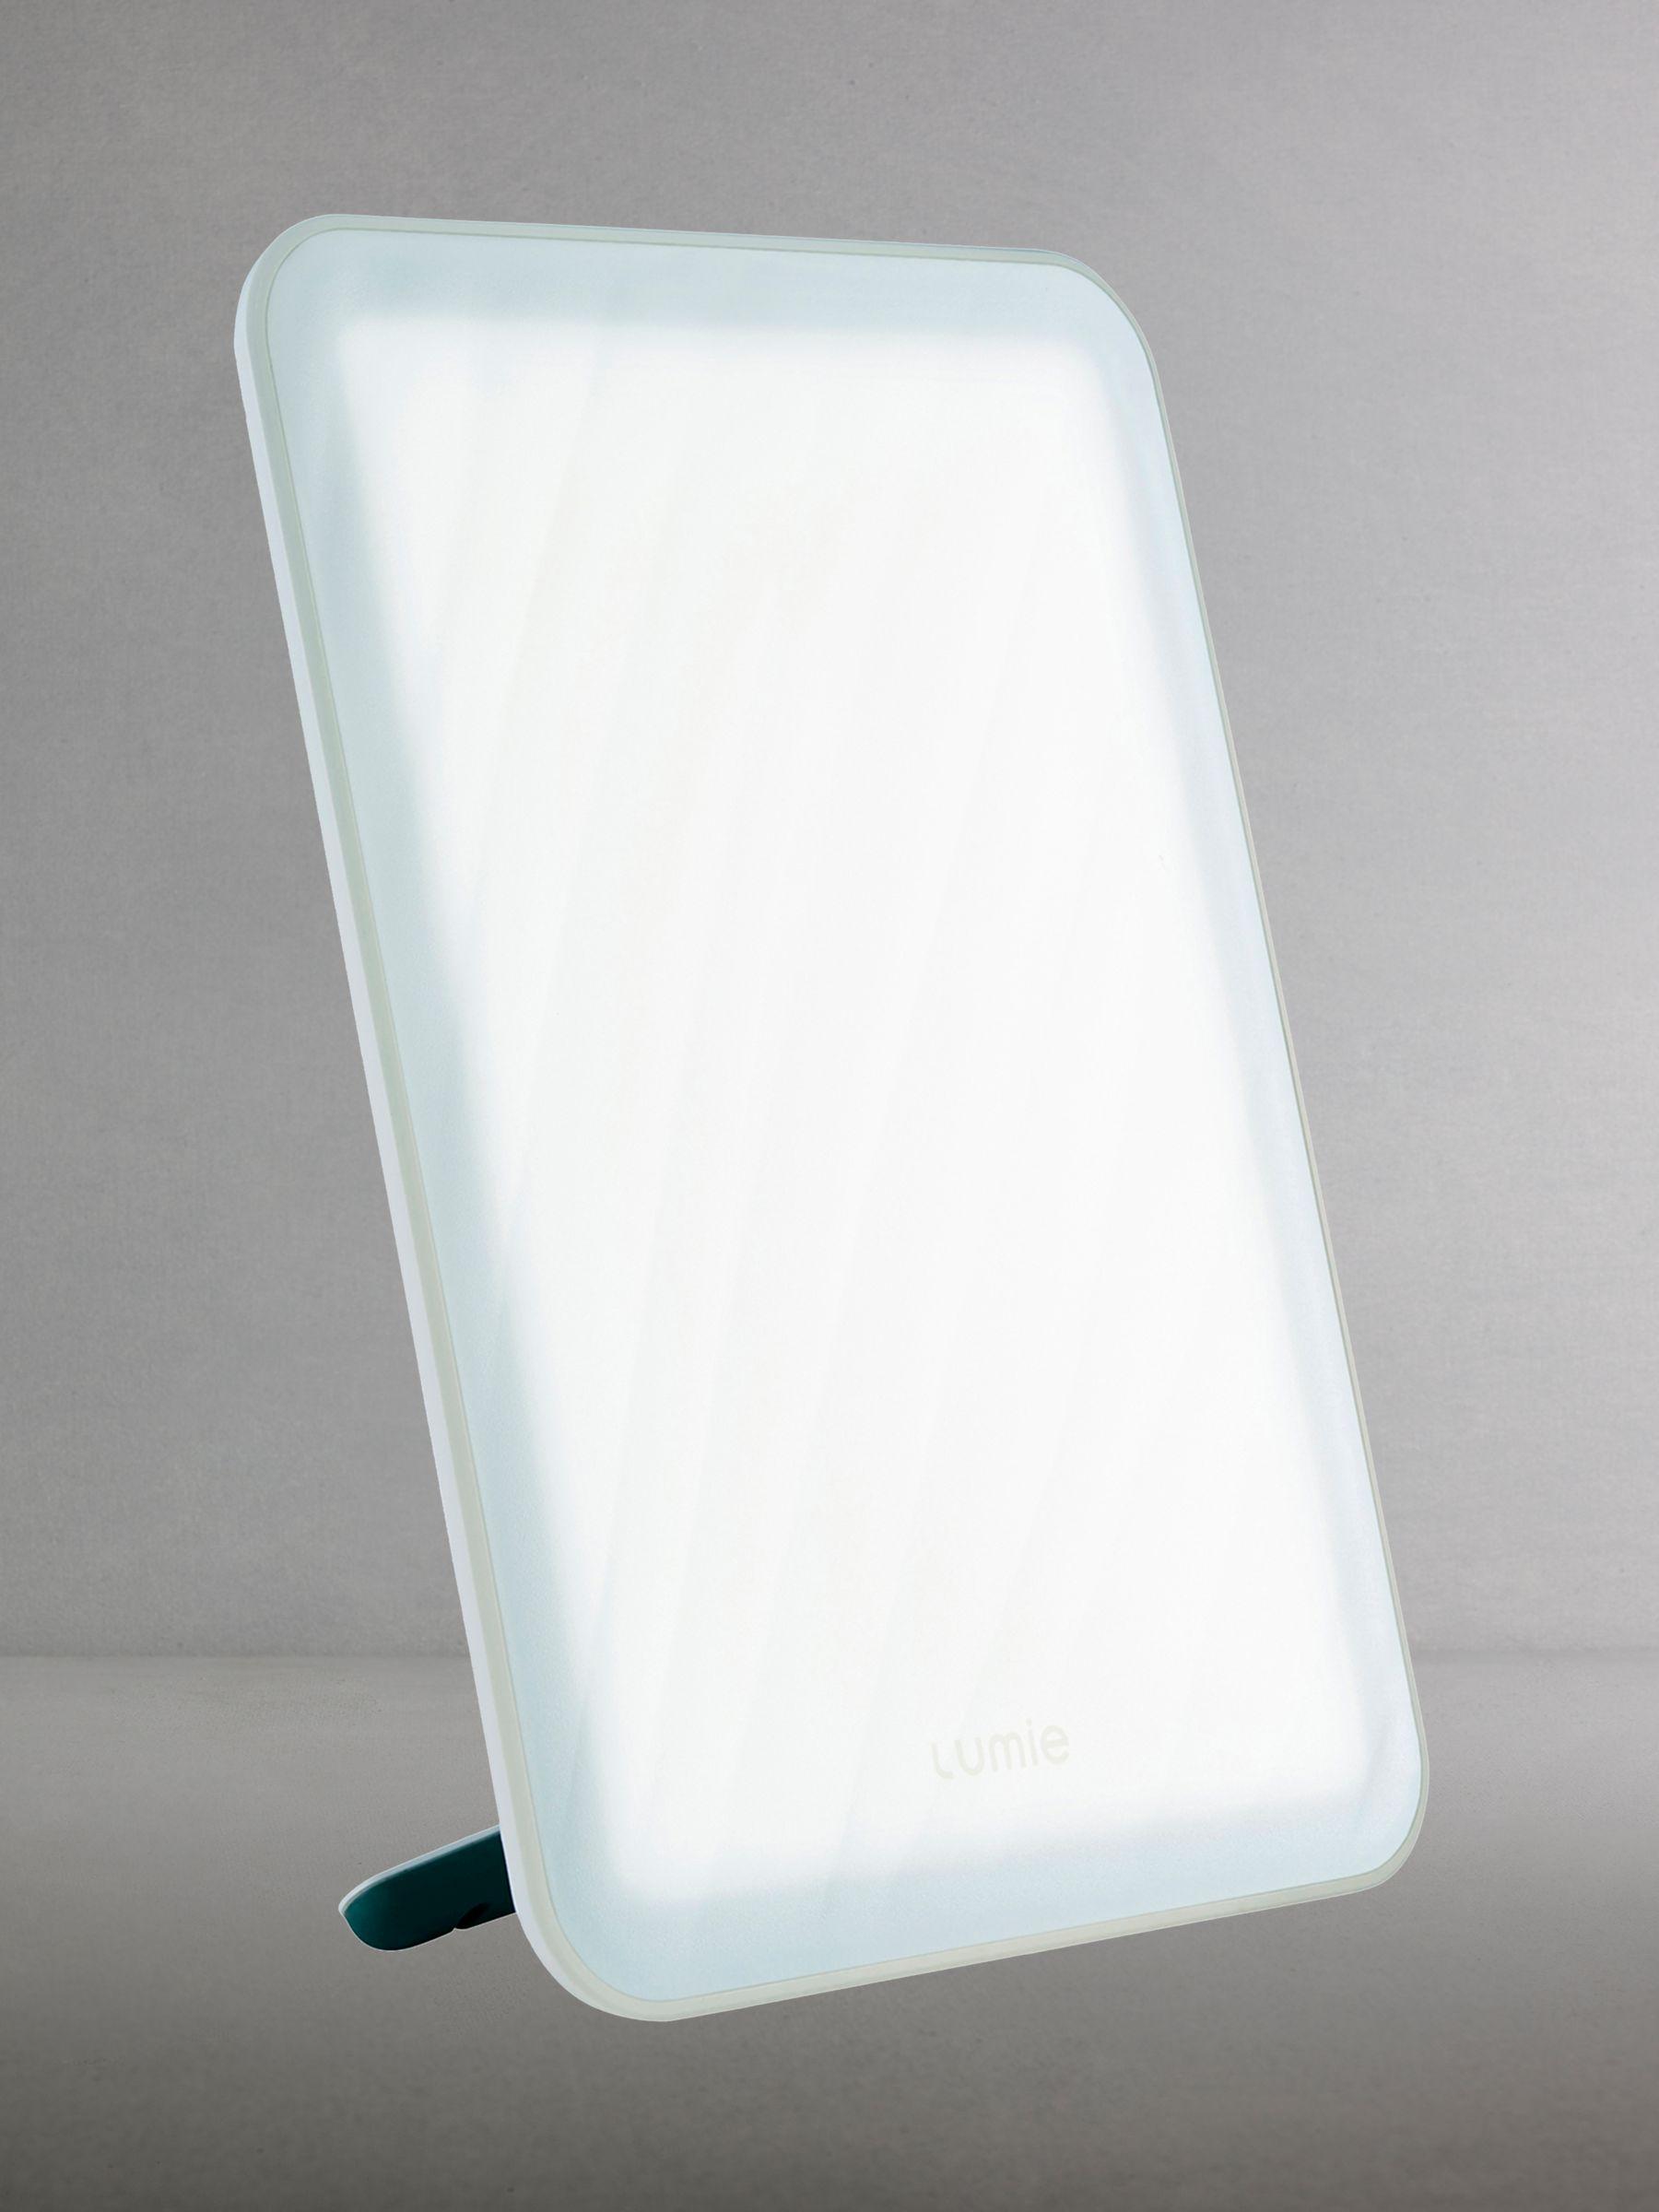 Lumie Lumie Vitamin L Slim SAD Light, White